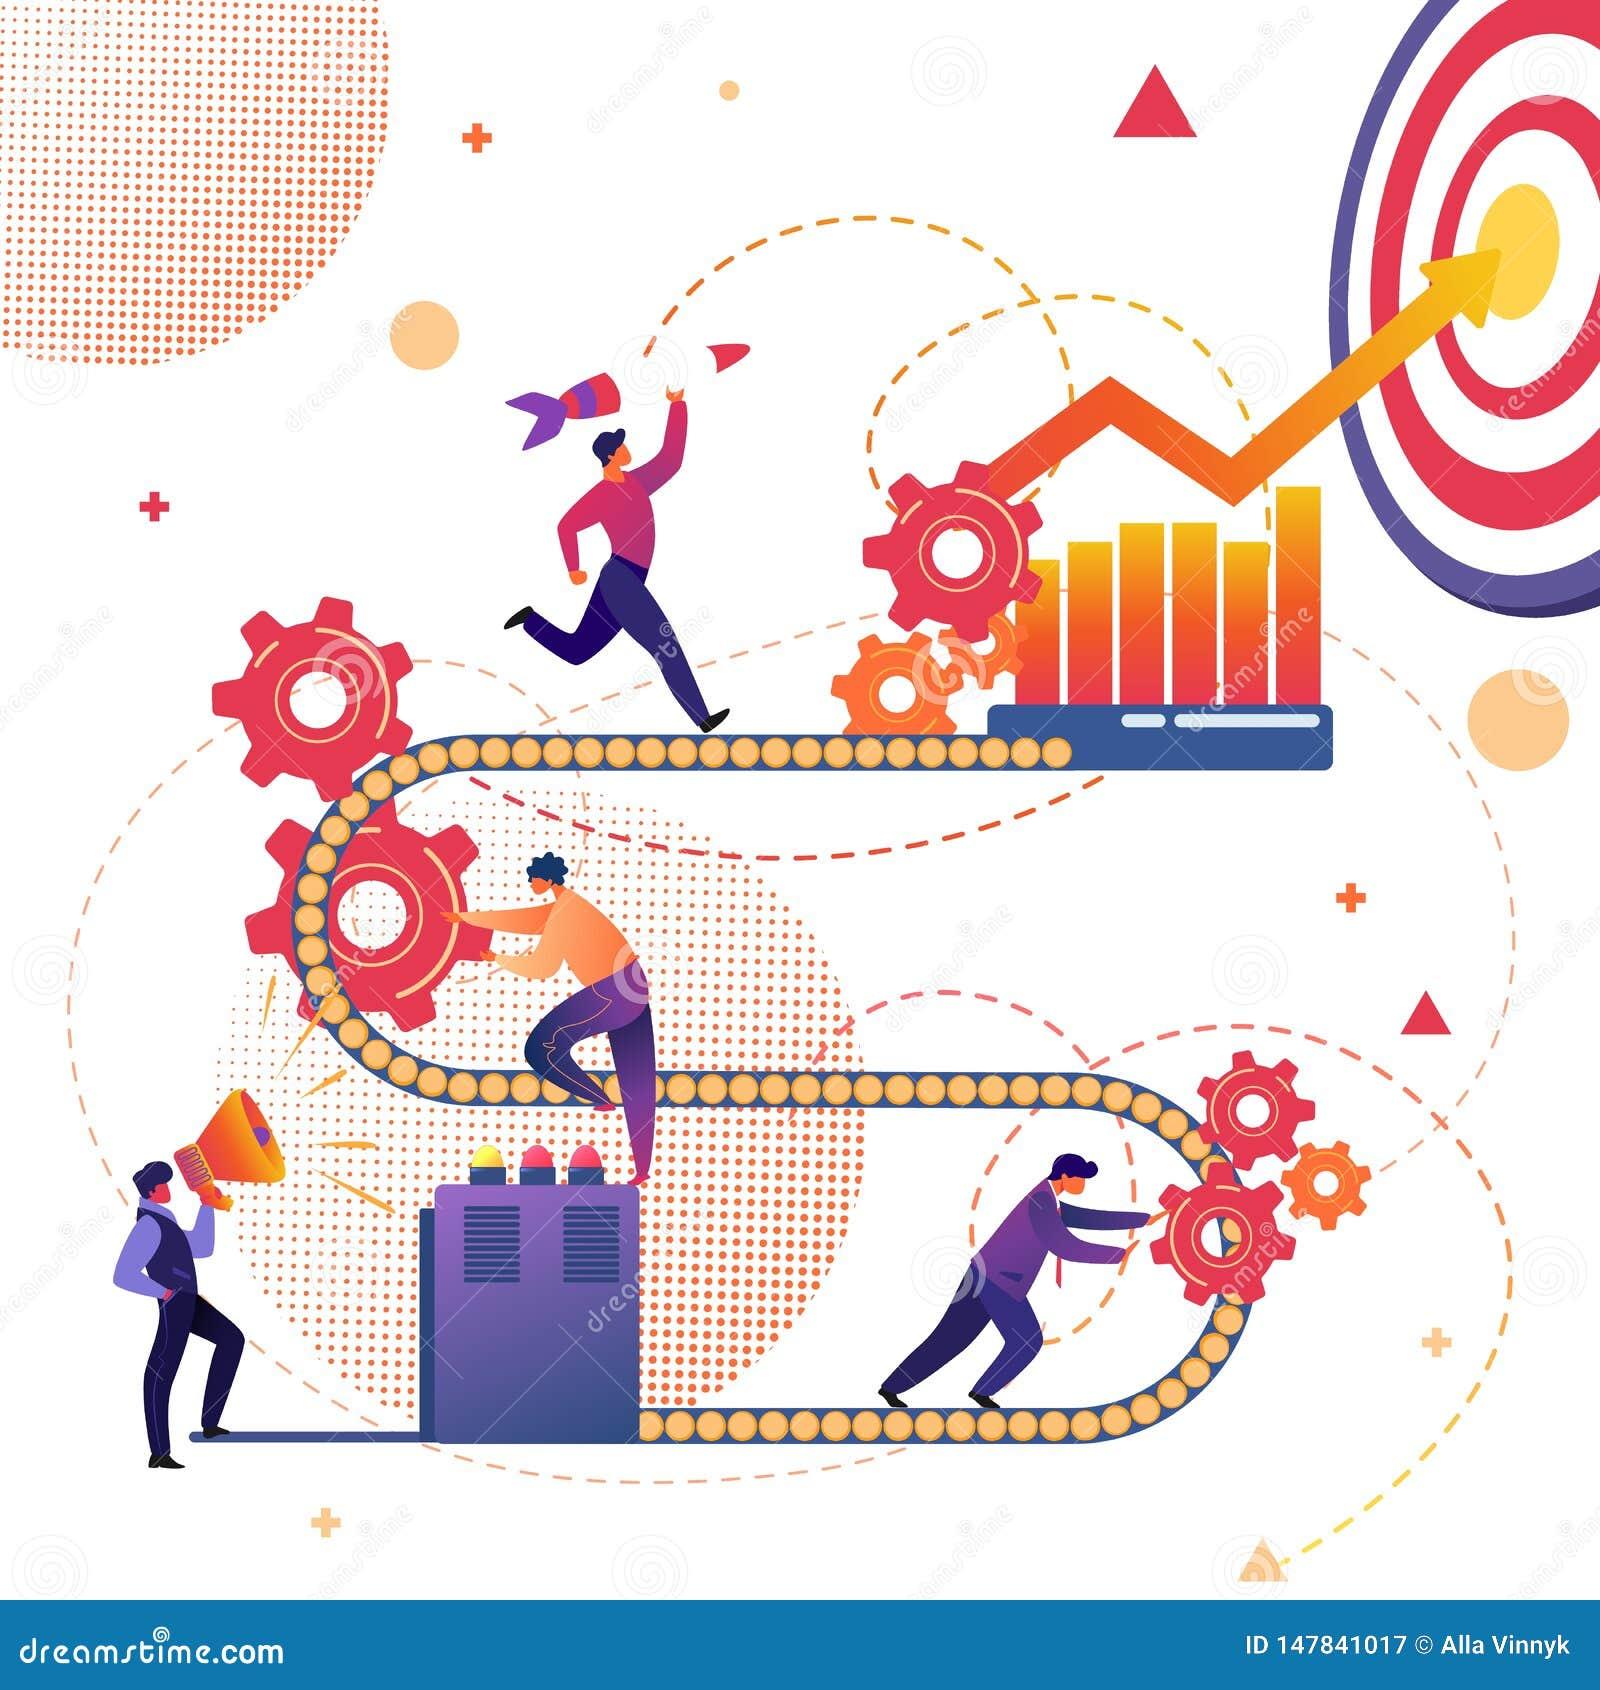 Business Process of Success Achievement Metaphor.